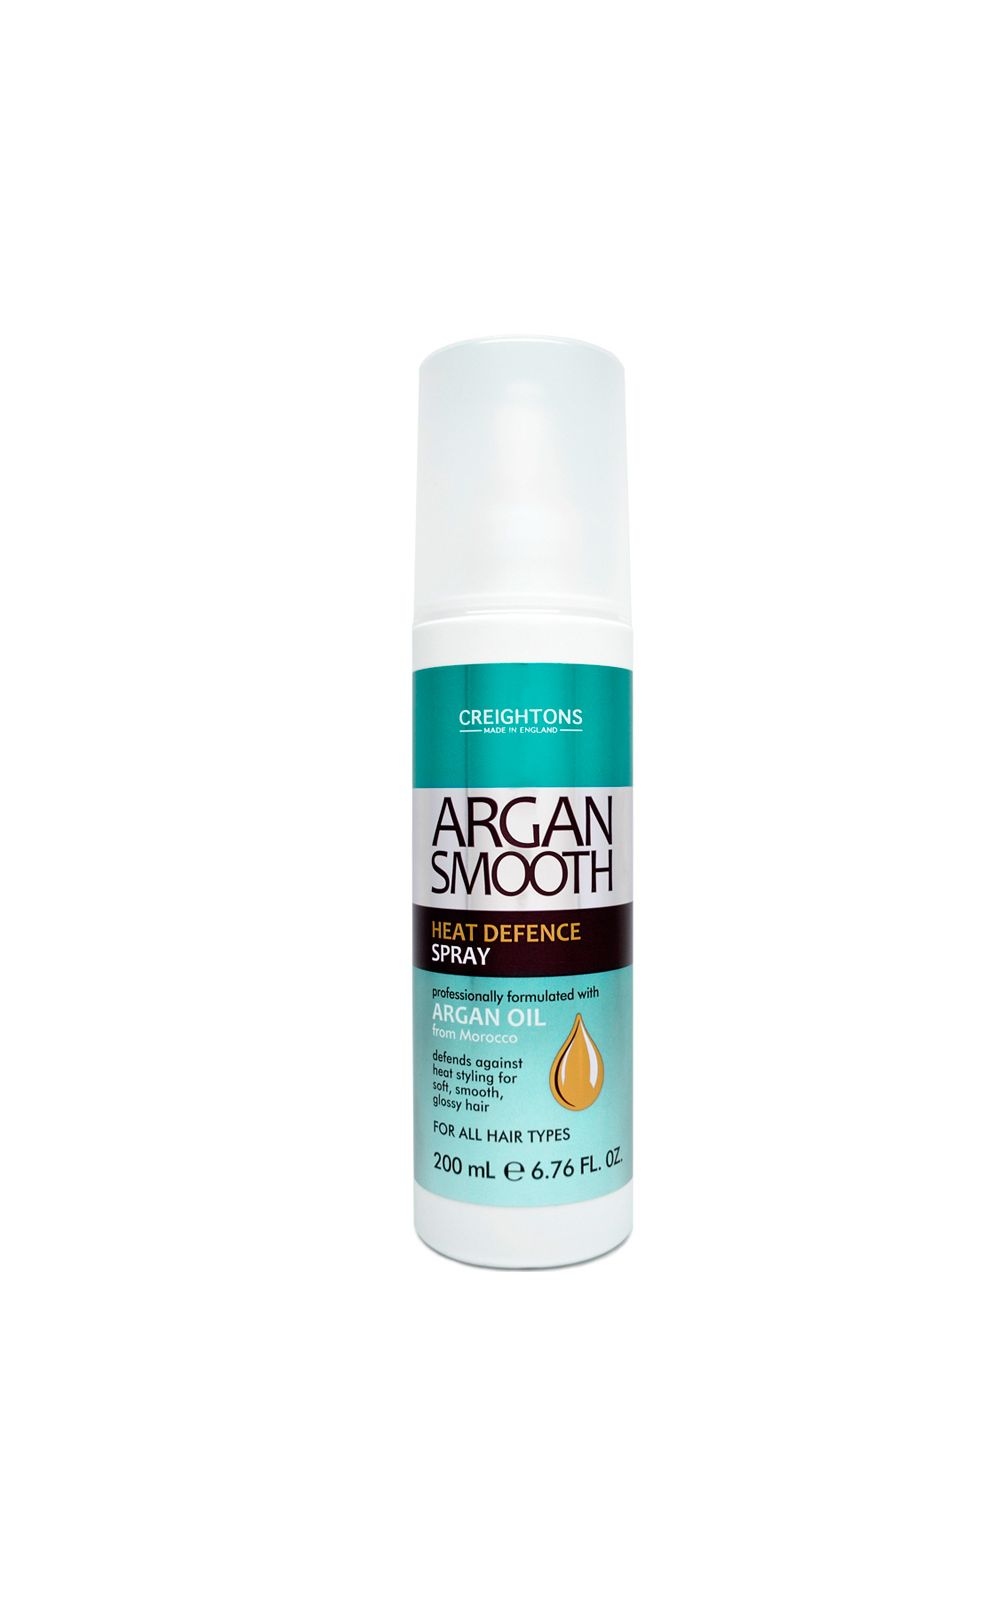 Foto 1 - Creightons Argan Smooth Heat Defence Spray - Protetor Térmico - 200ml